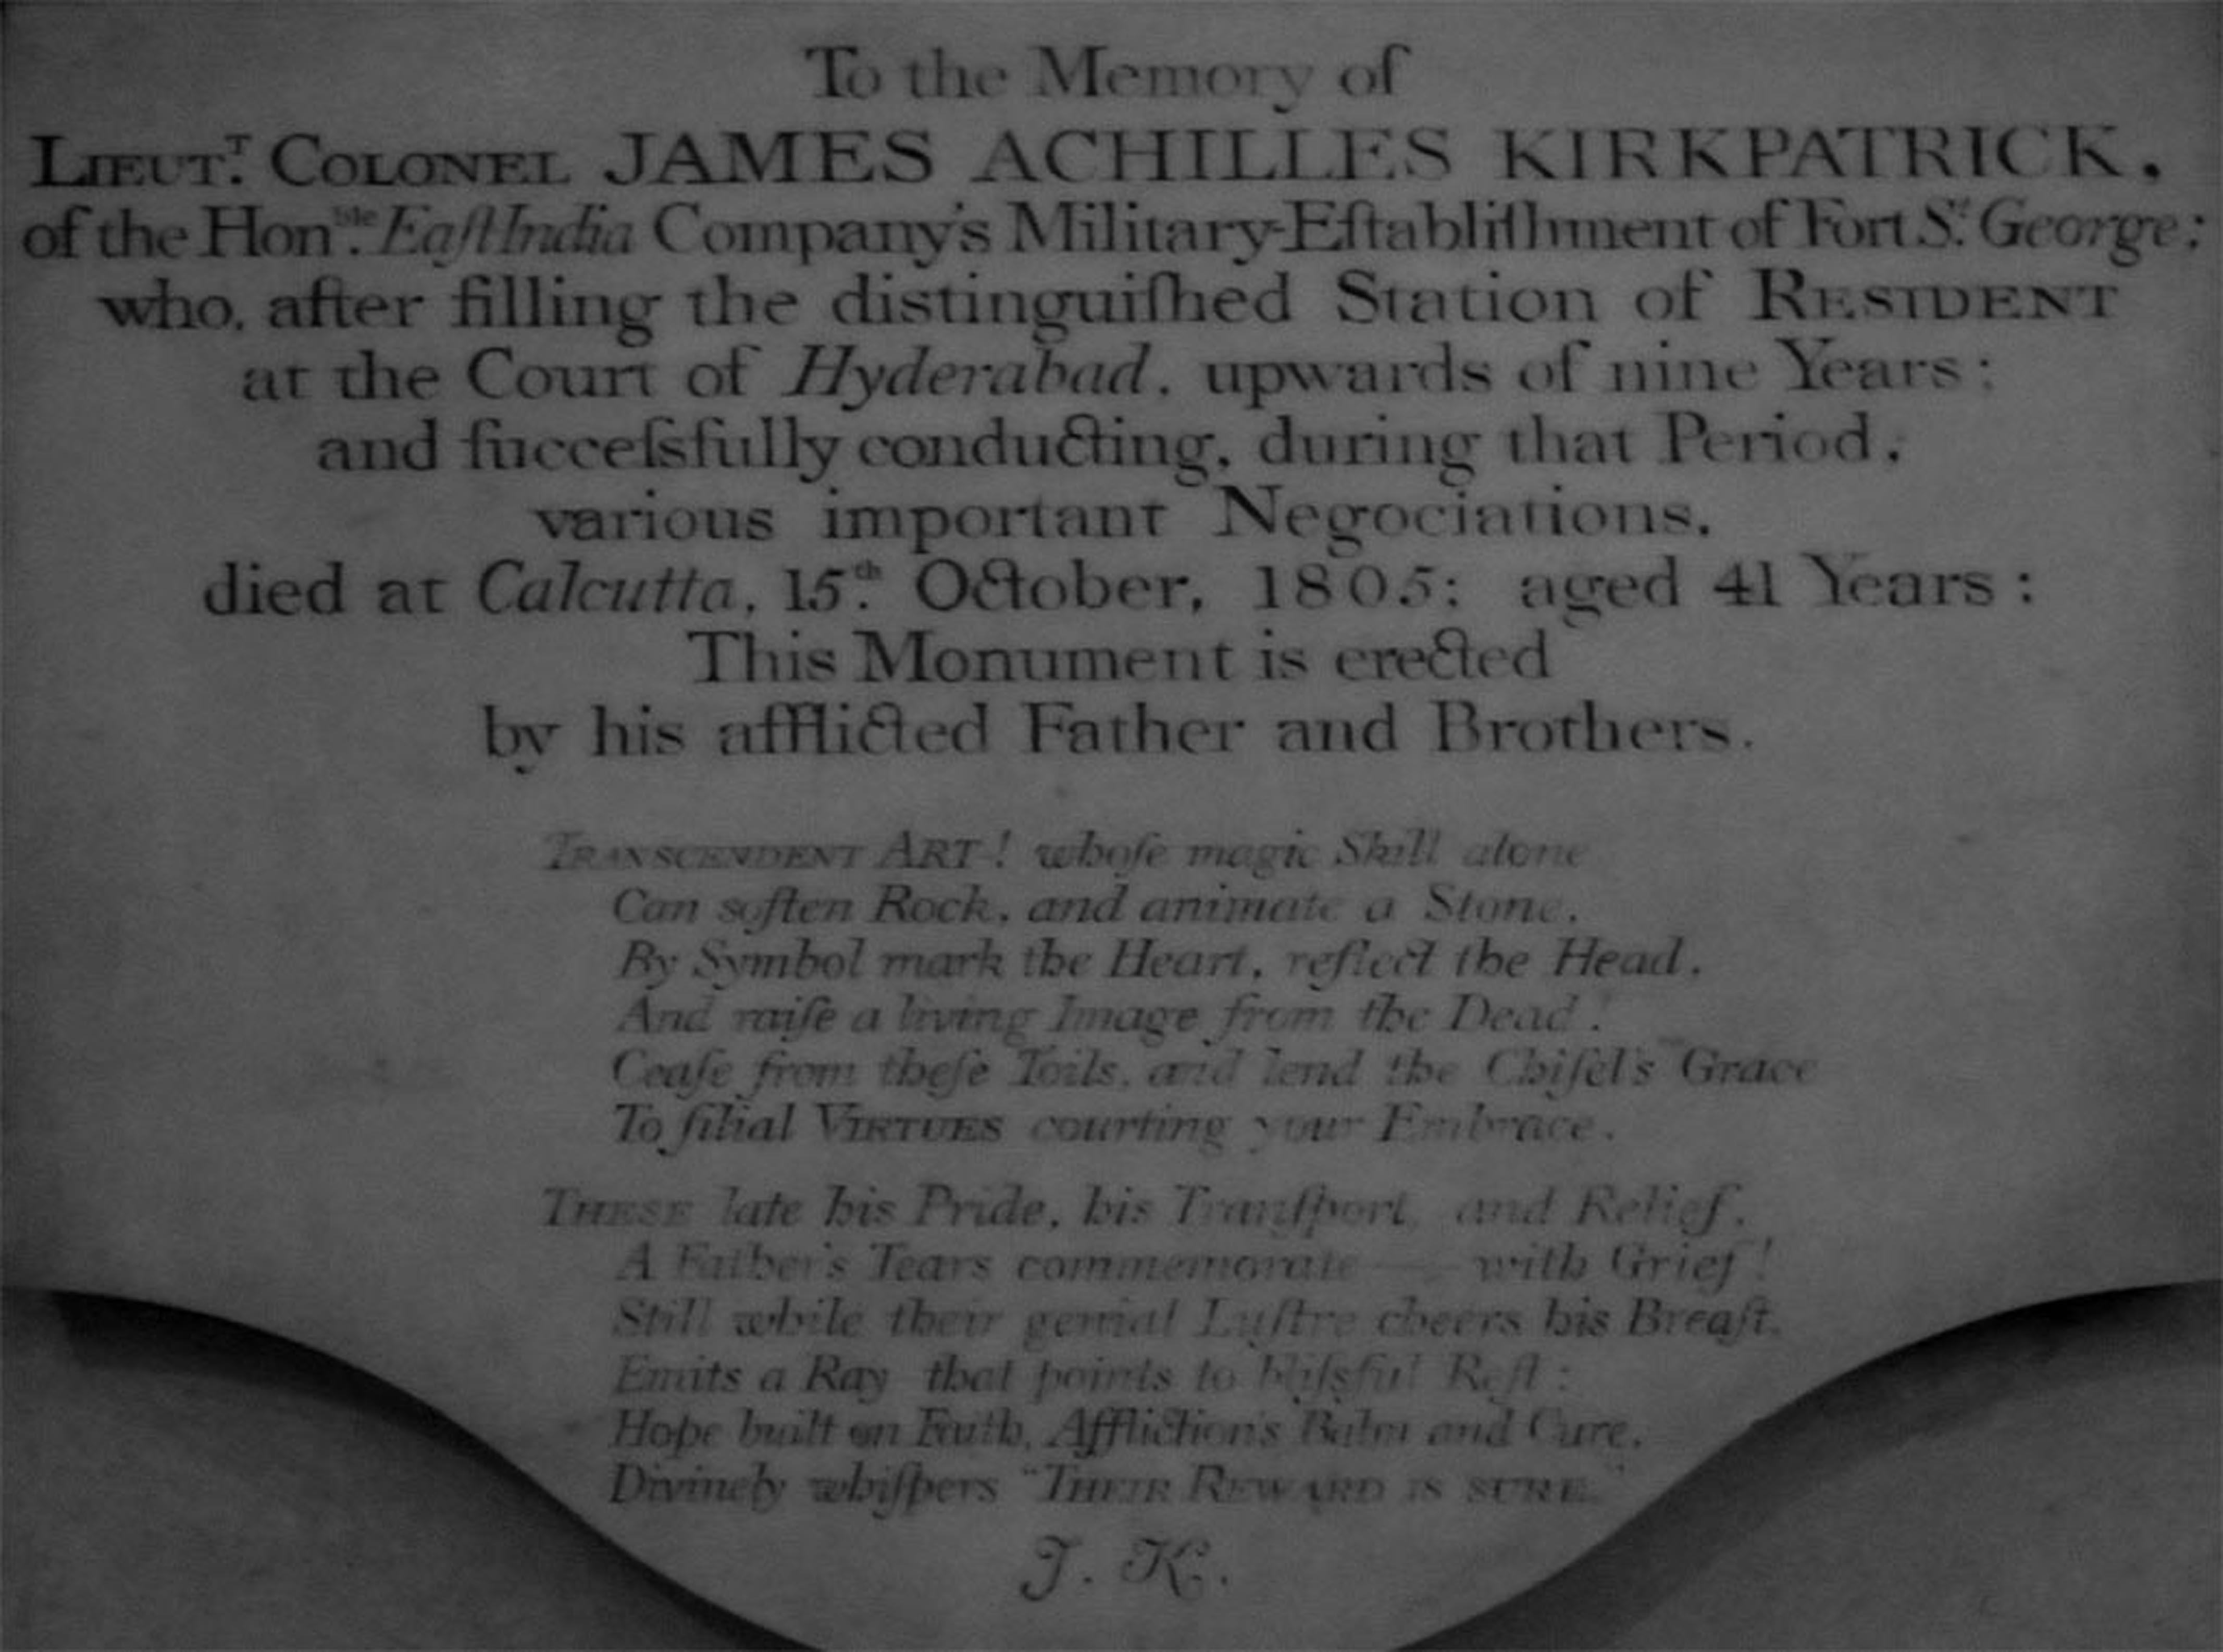 James Achilles Kirkpatrick